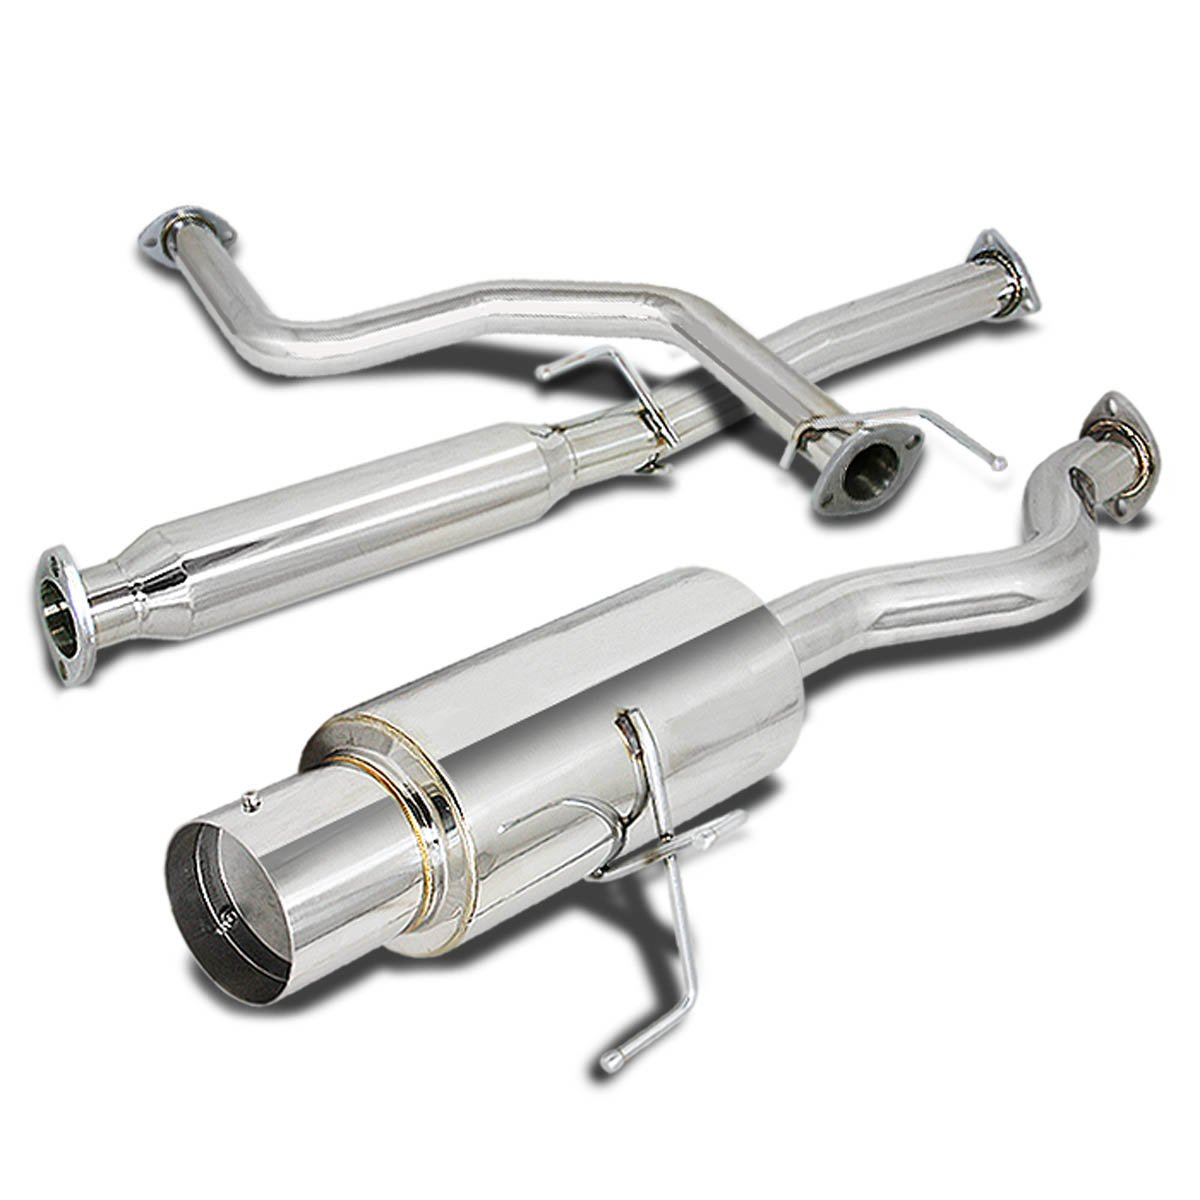 Stainless Steel 4.5 Muffler Tip Exhaust Catback+Header Manifold+Pipe for Honda Civic 96-00 Hatchback